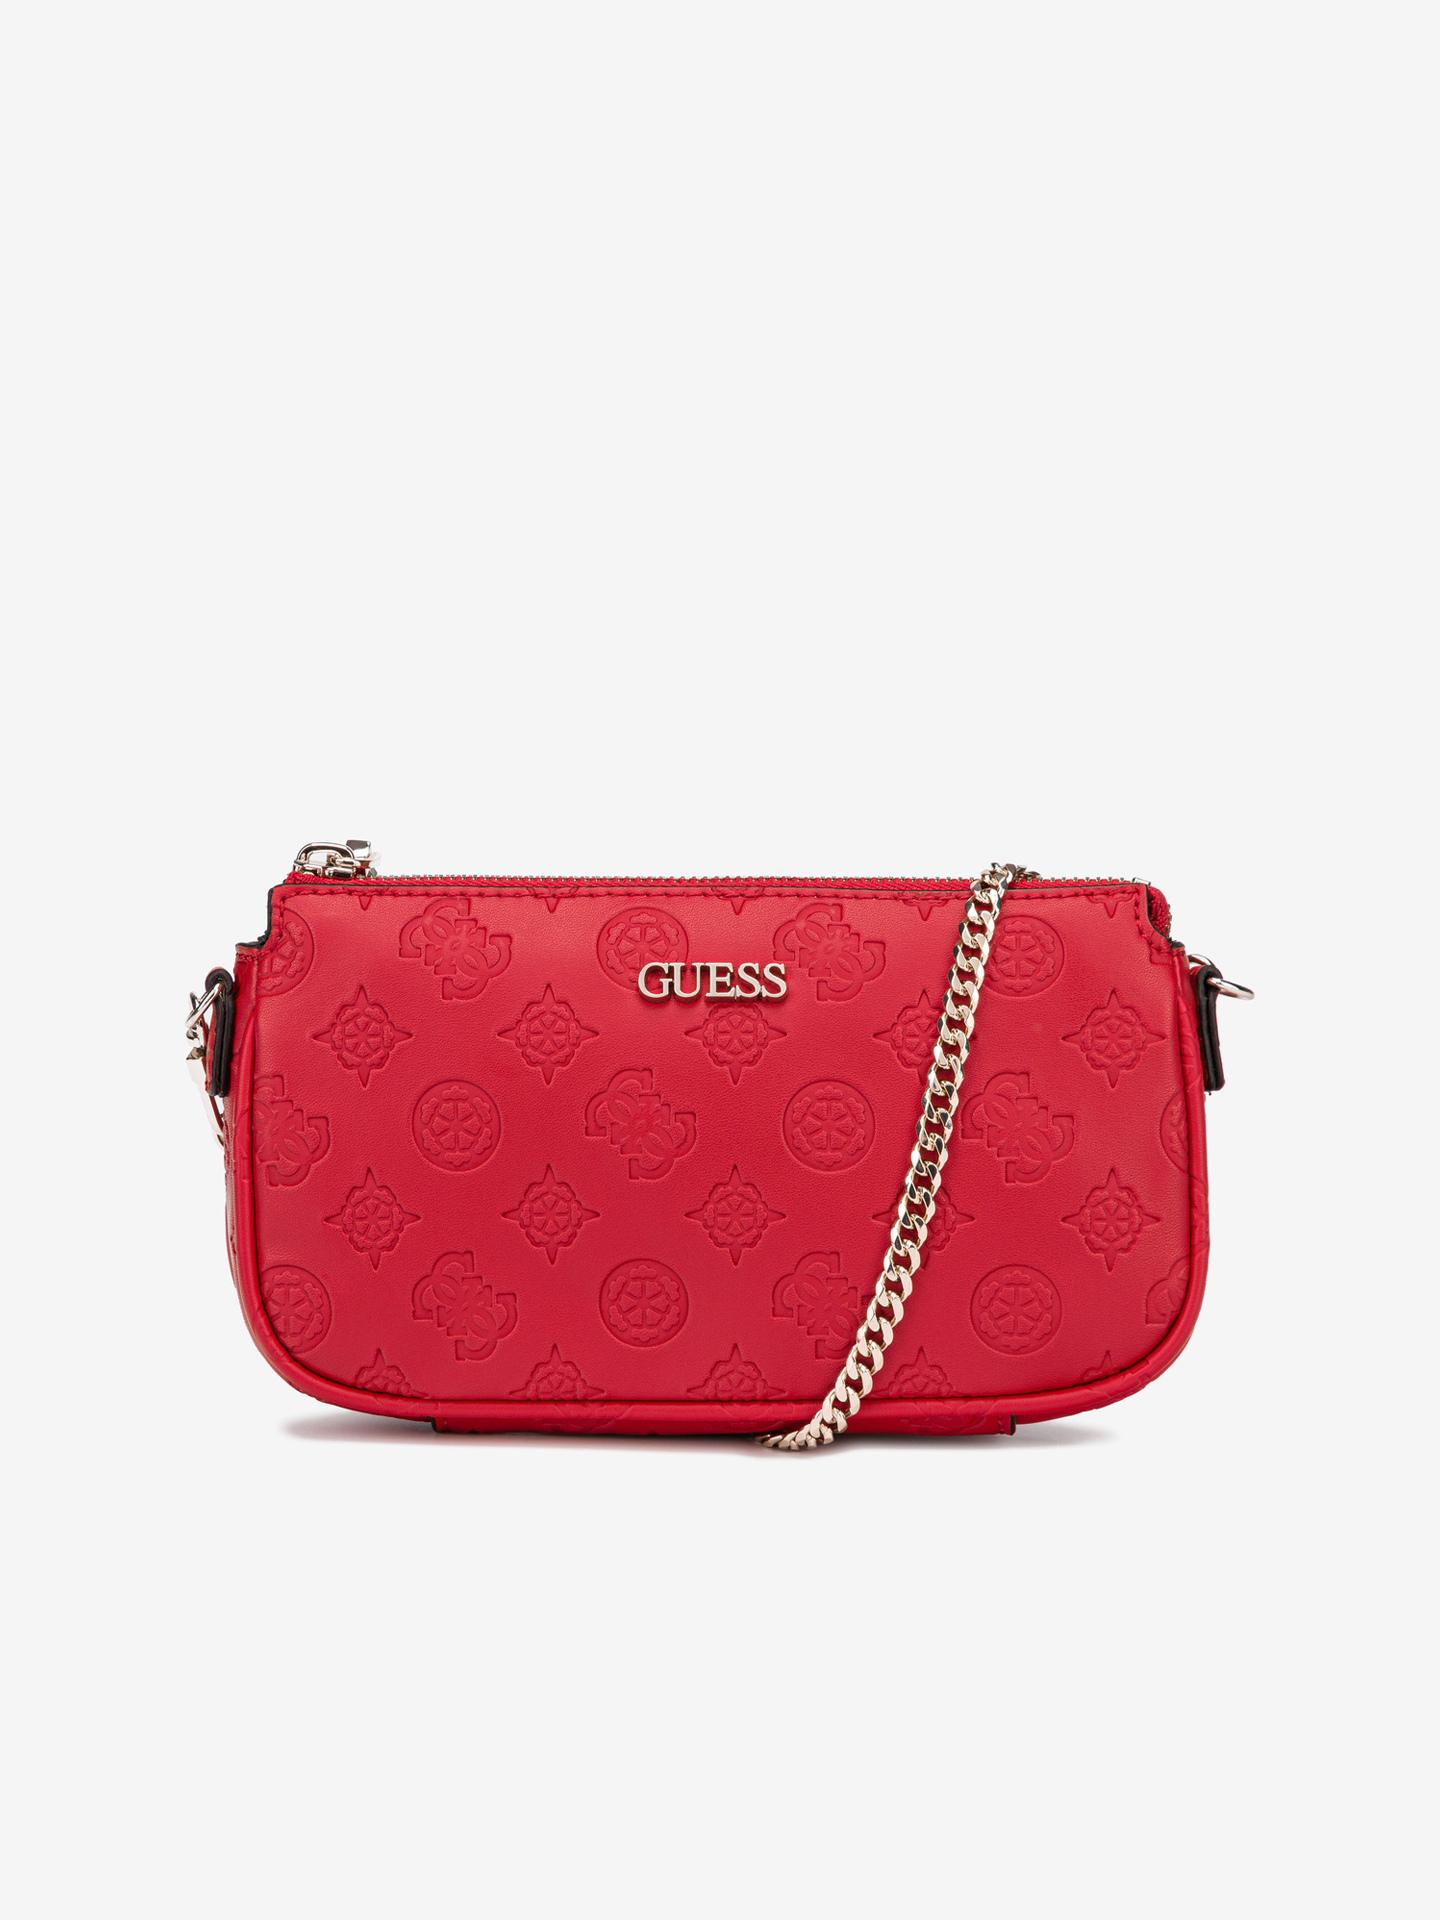 Guess red 2in1 crossbody handbag Dayane Double